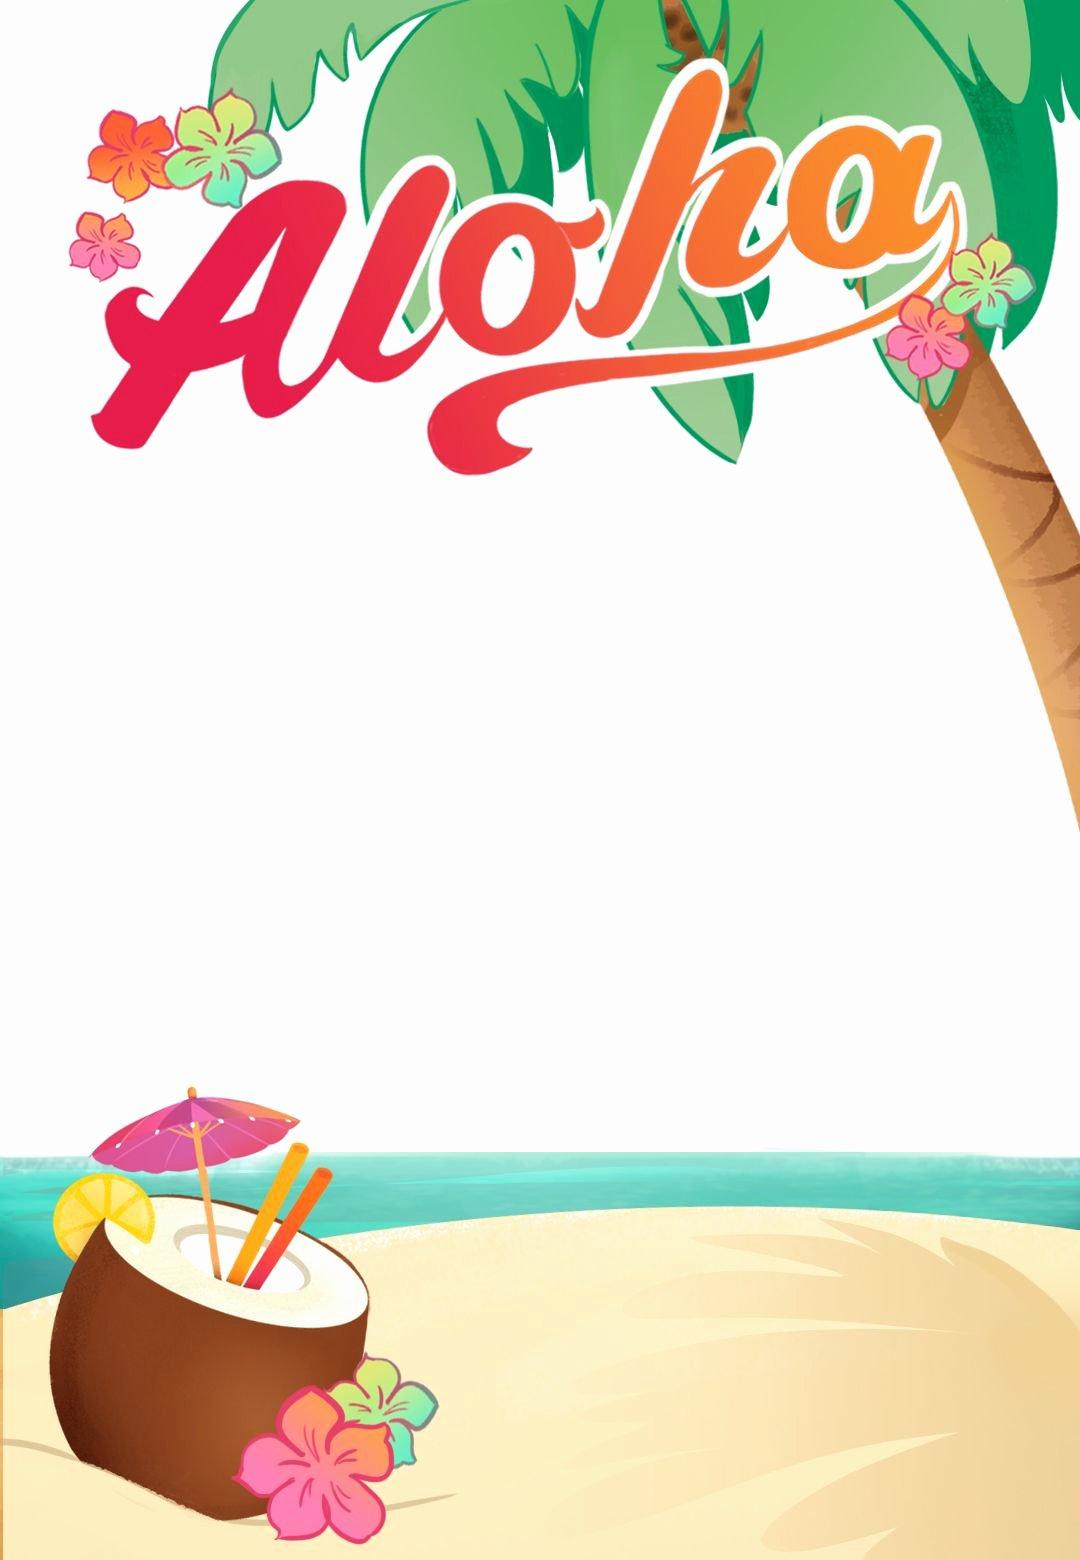 Hawaiian Party Invitation Template Inspirational Luau Party Free Printable Summer Party Invitation